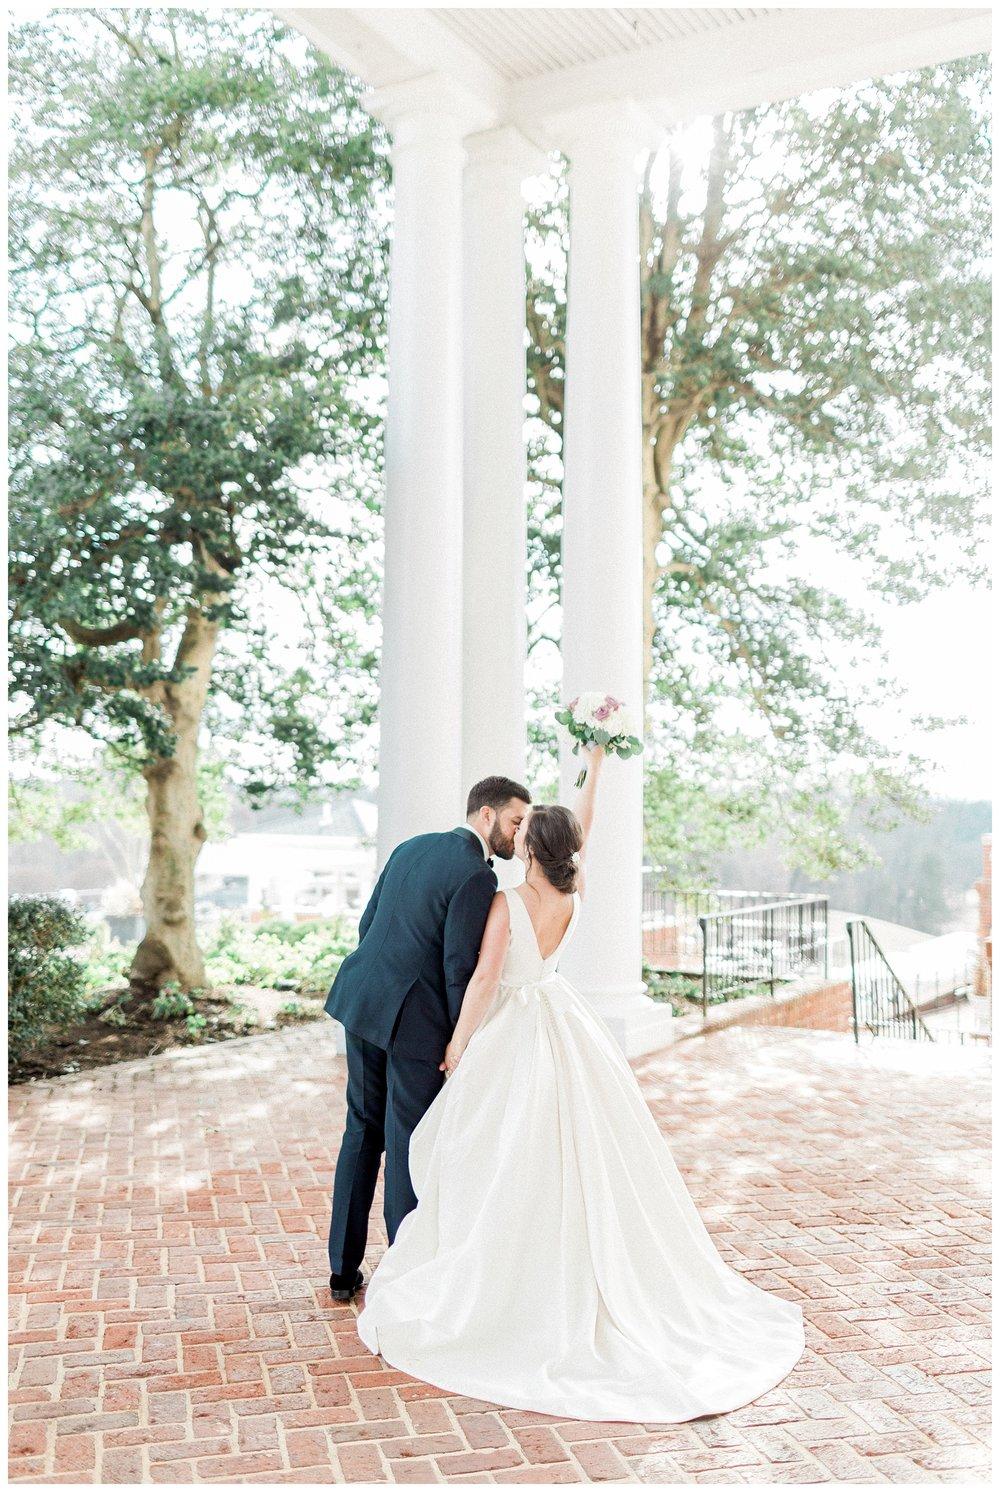 Country Club of Virginia Wedding | Richmond Wedding Photographer_0120.jpg